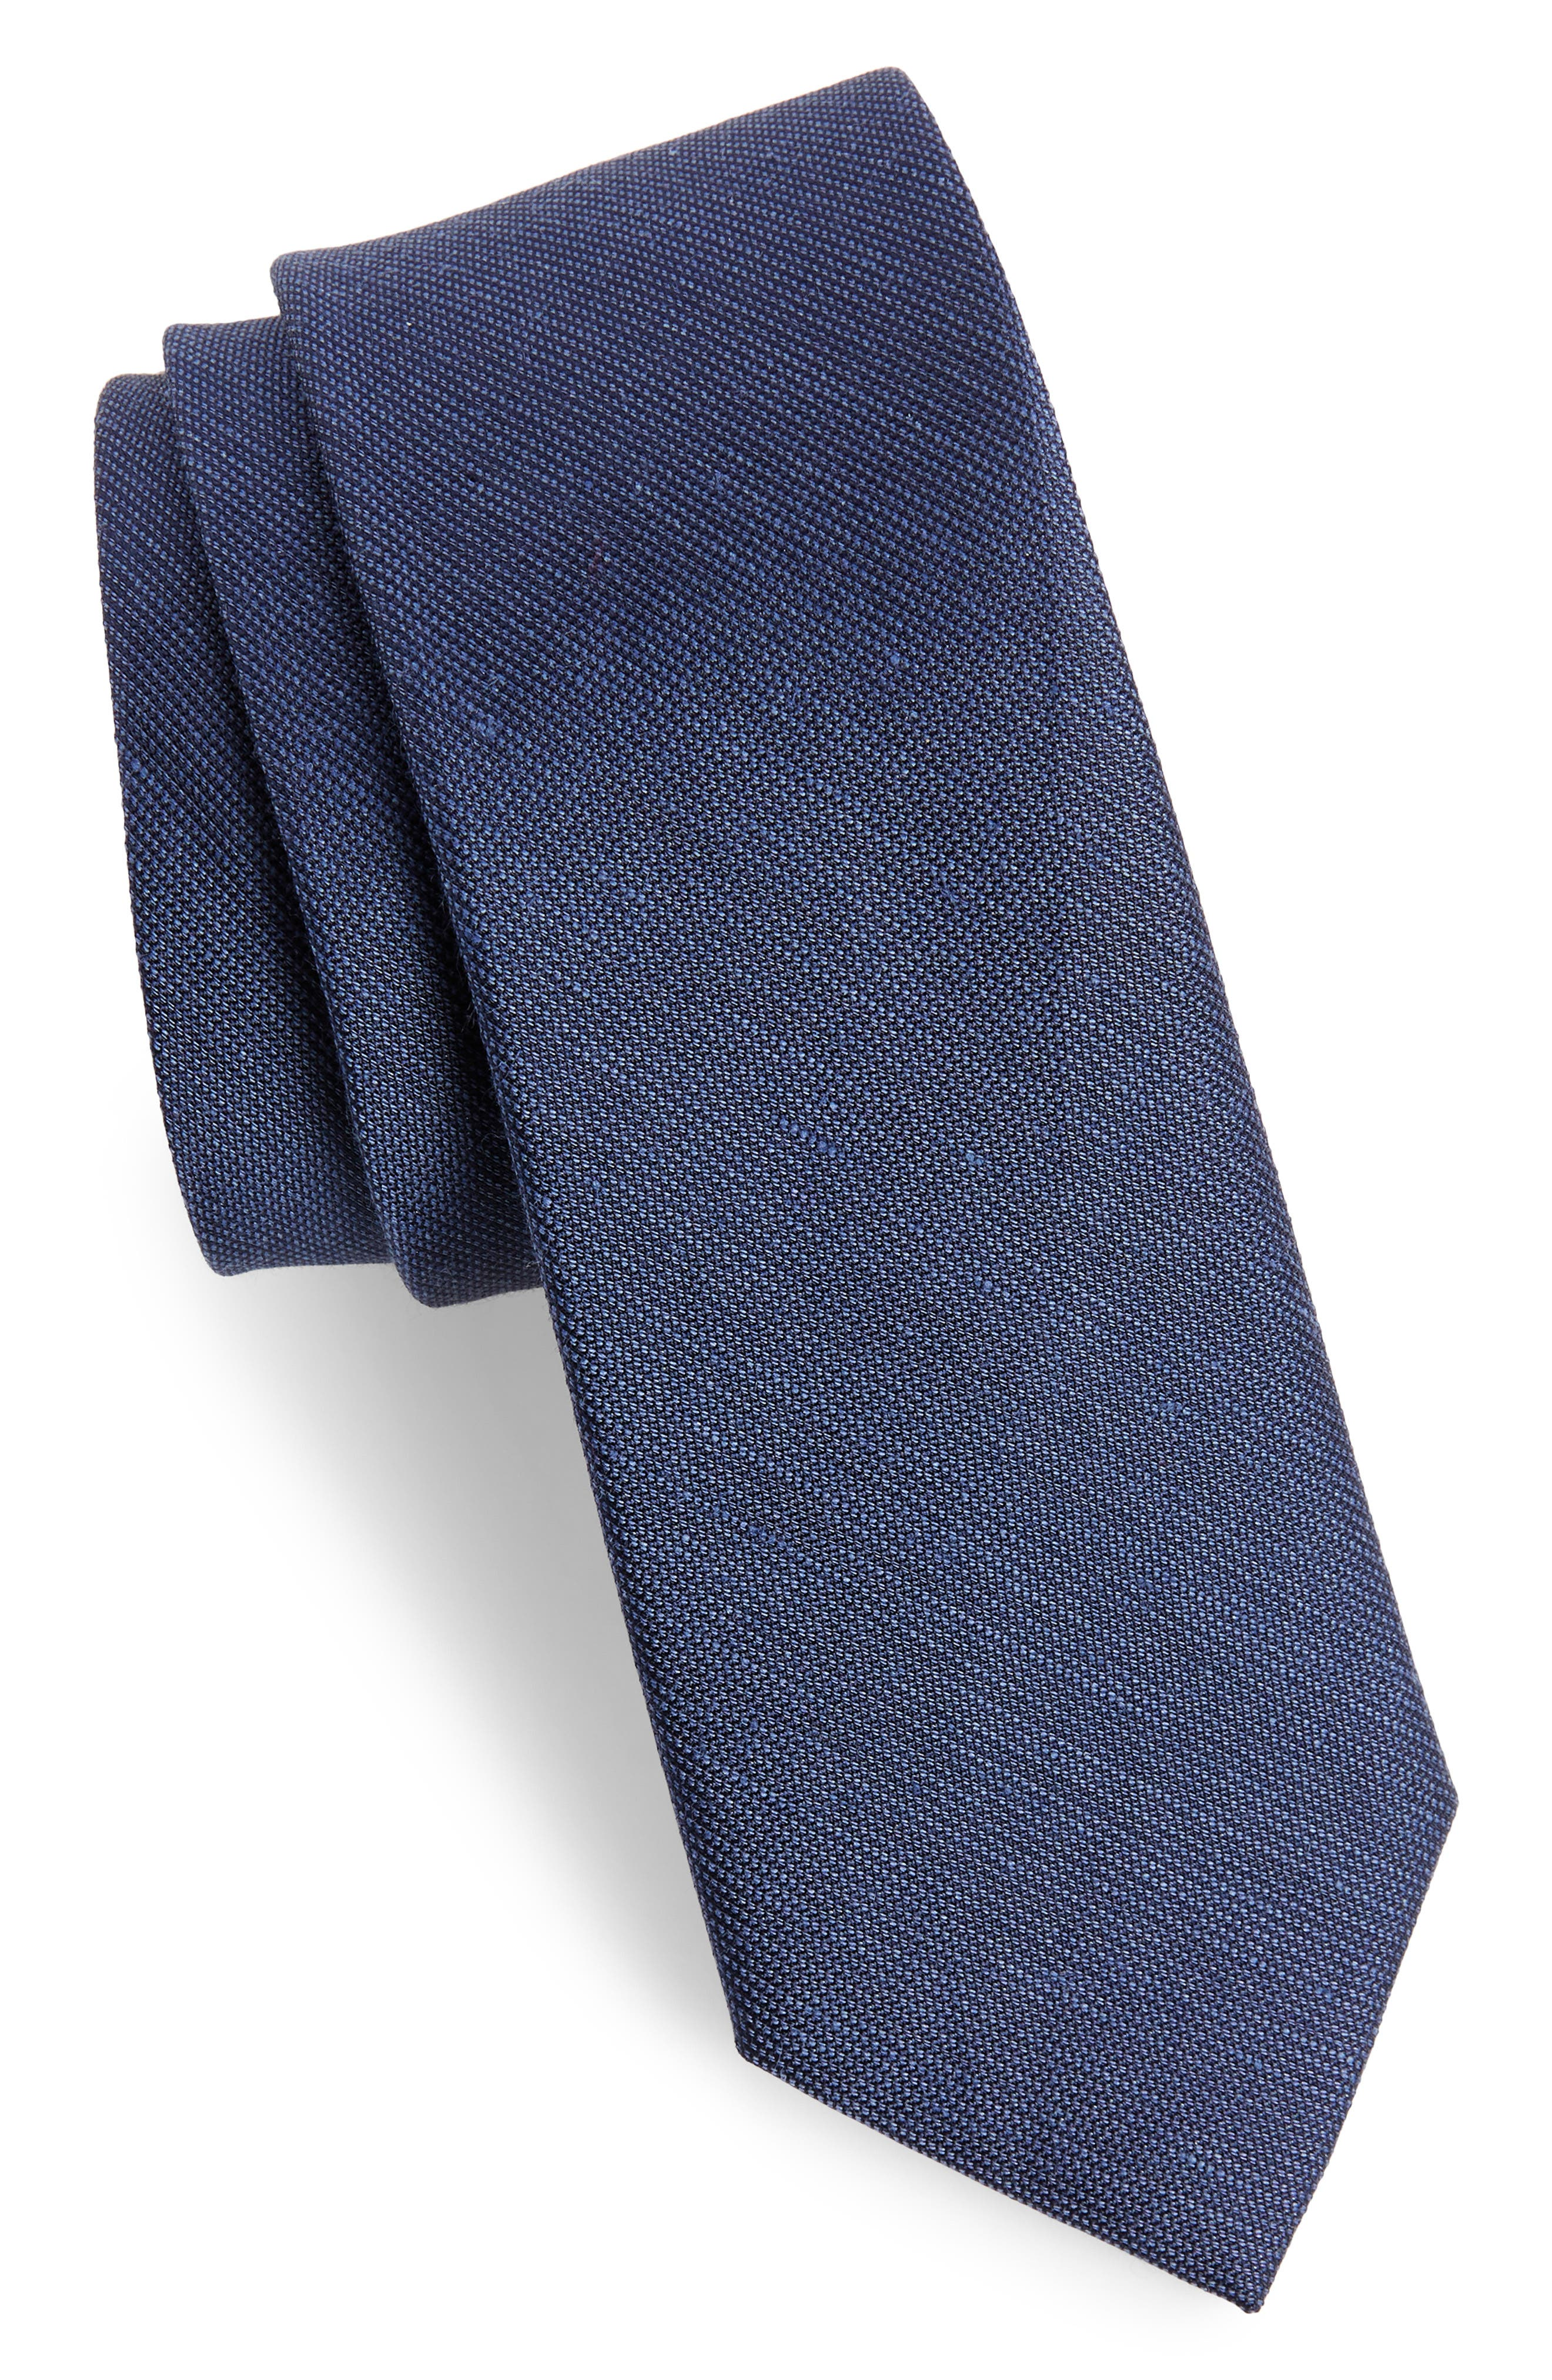 Cardinal Solid Silk & Cotton Tie,                             Main thumbnail 1, color,                             410